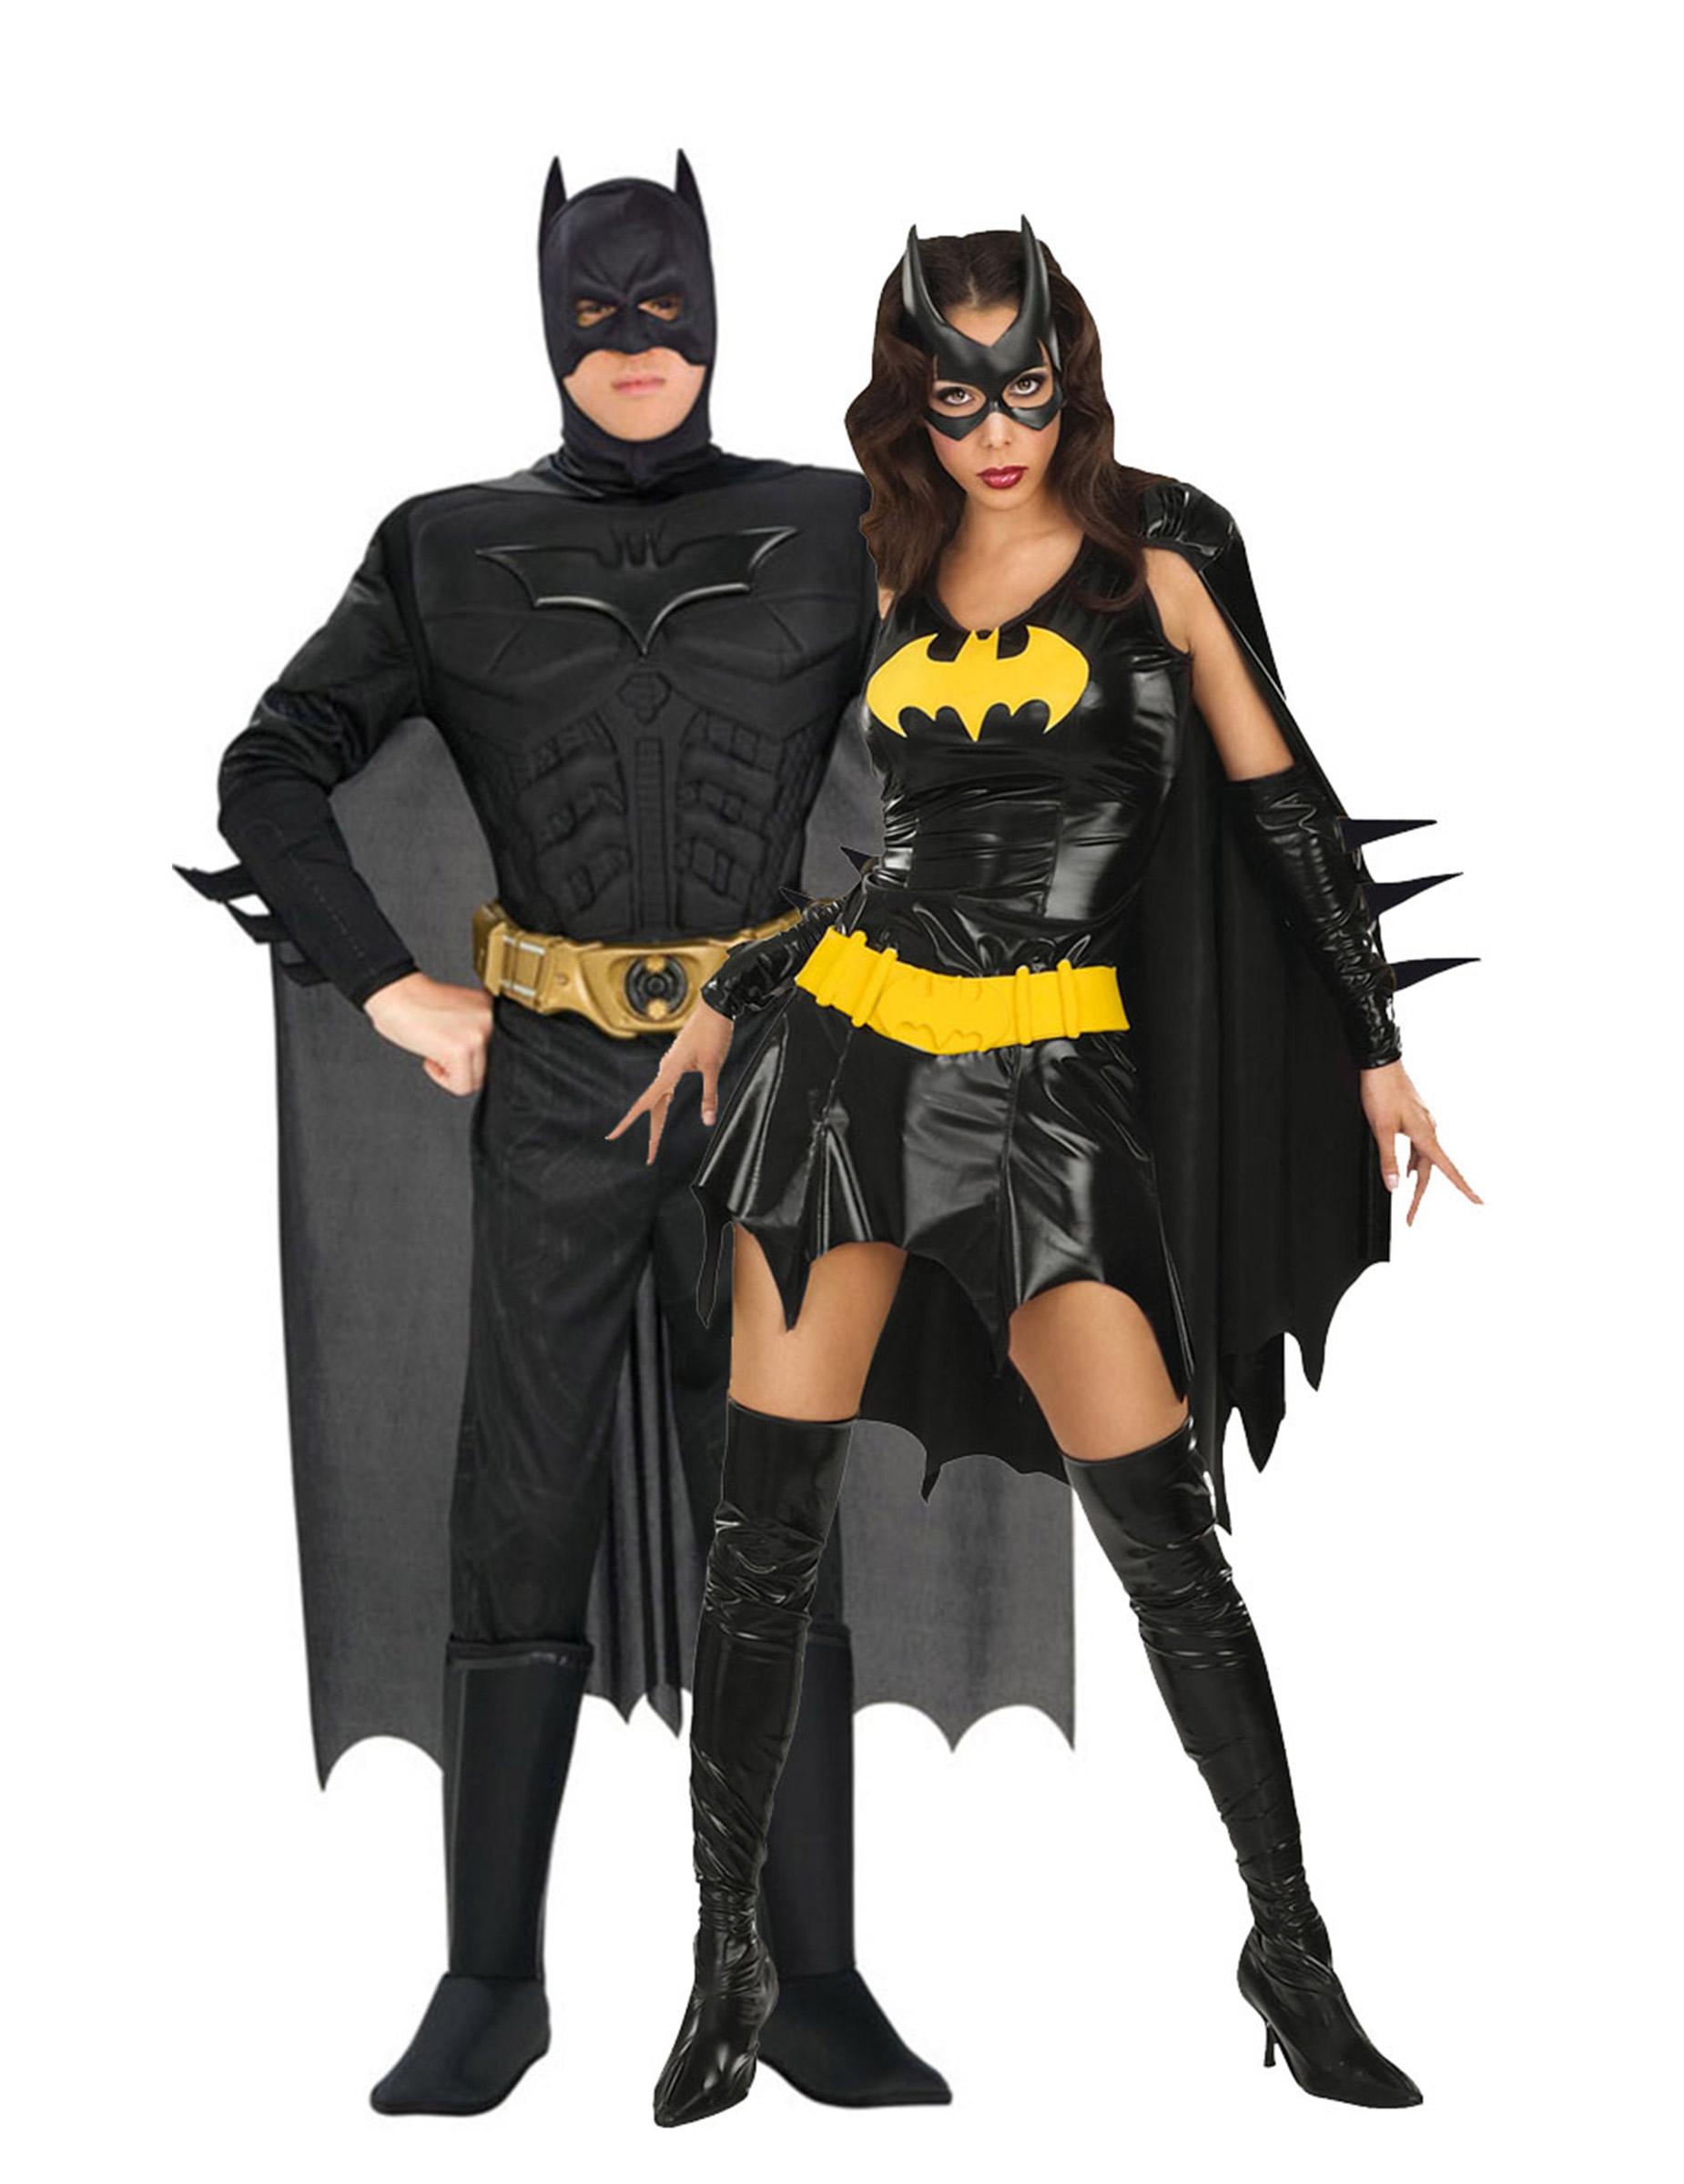 p rchen kost m set batman batgirl schwarz gelb. Black Bedroom Furniture Sets. Home Design Ideas